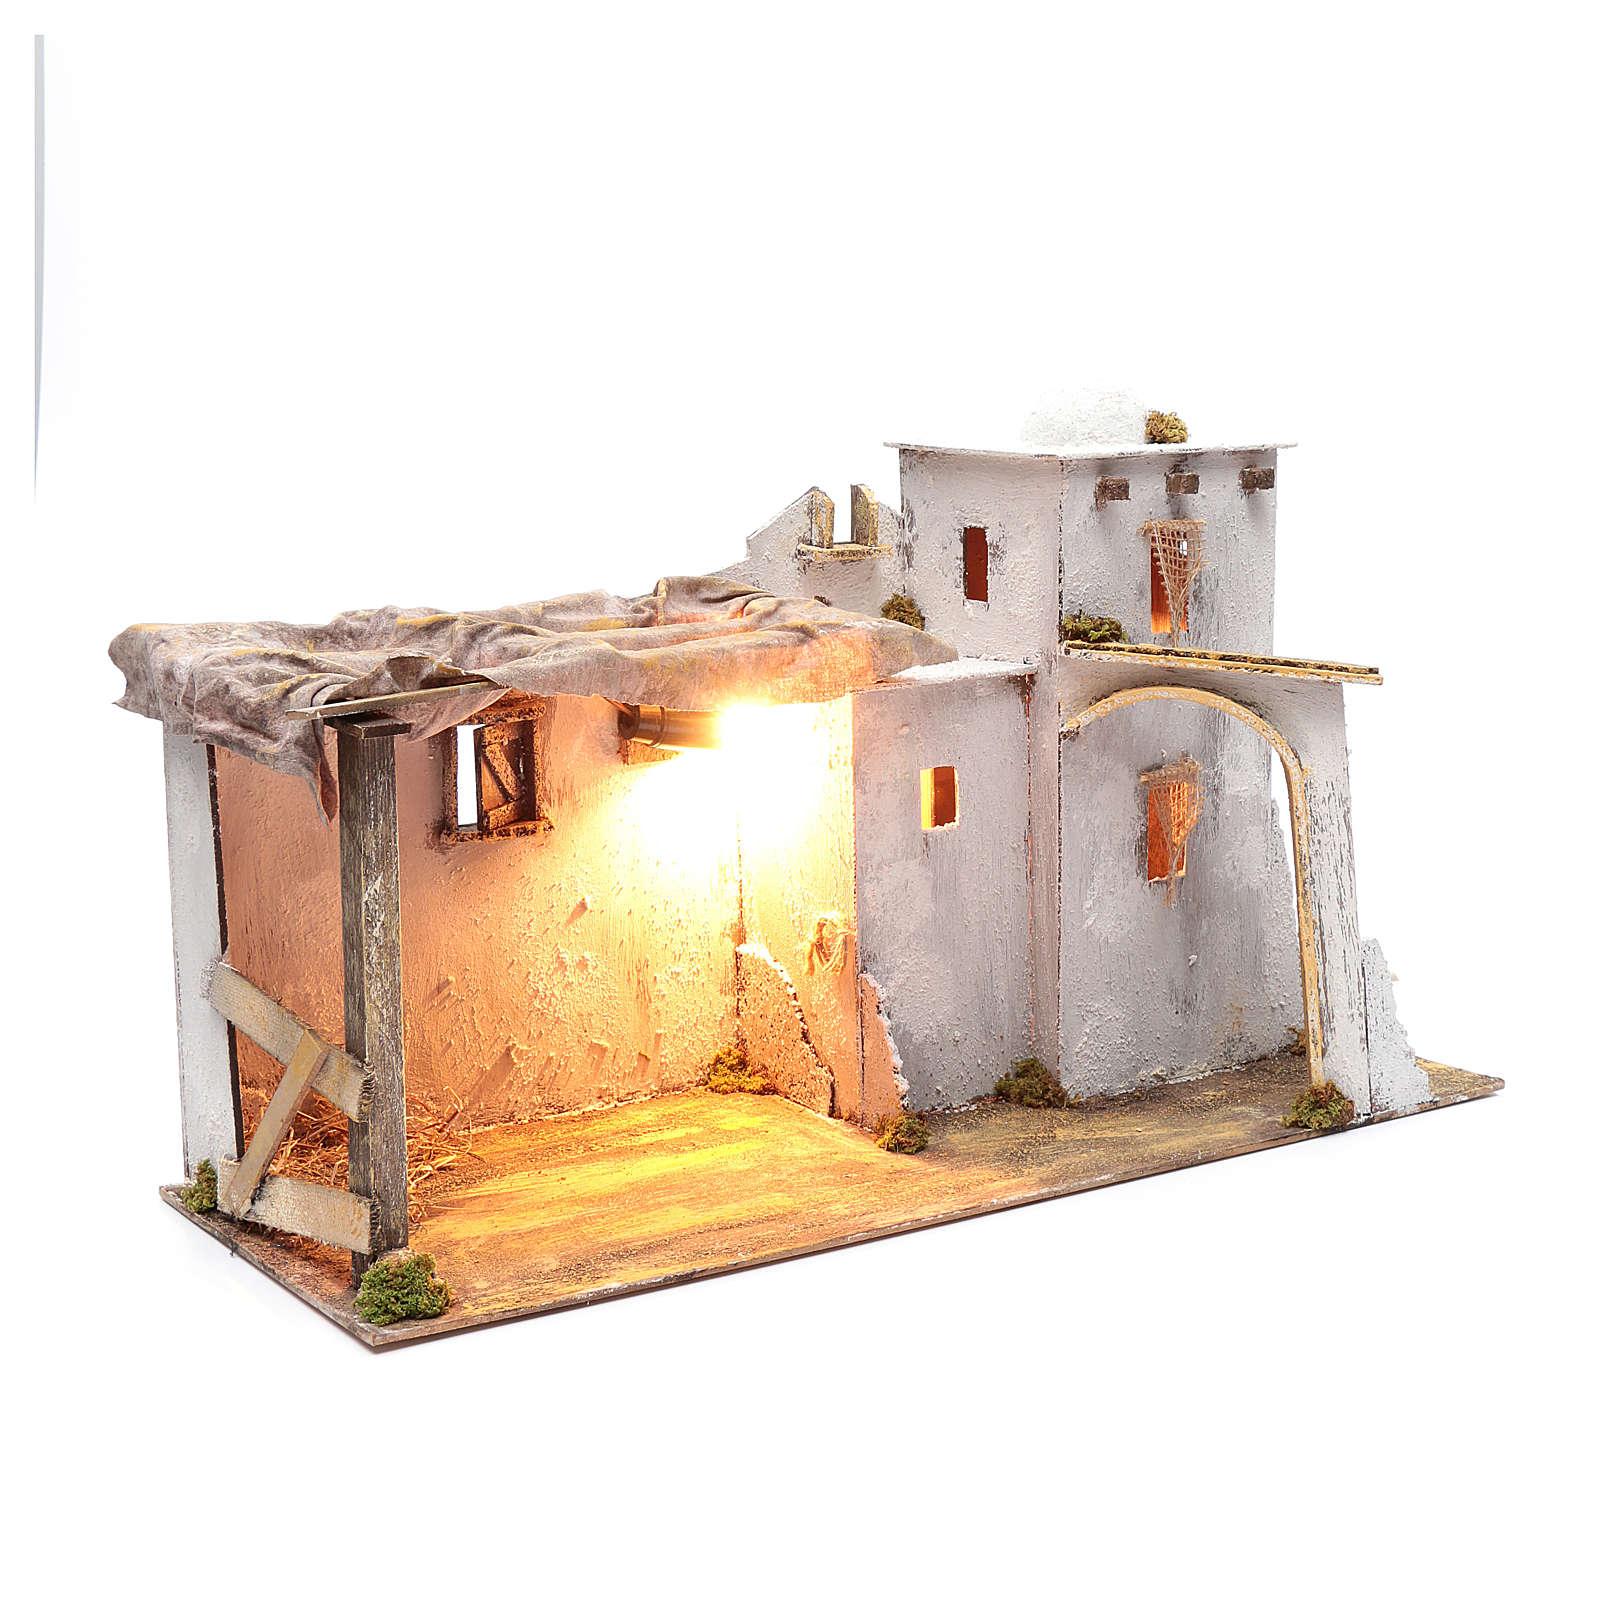 Arabian style Neapolitan Nativity scene setting with hut  35x60x25 cm 4